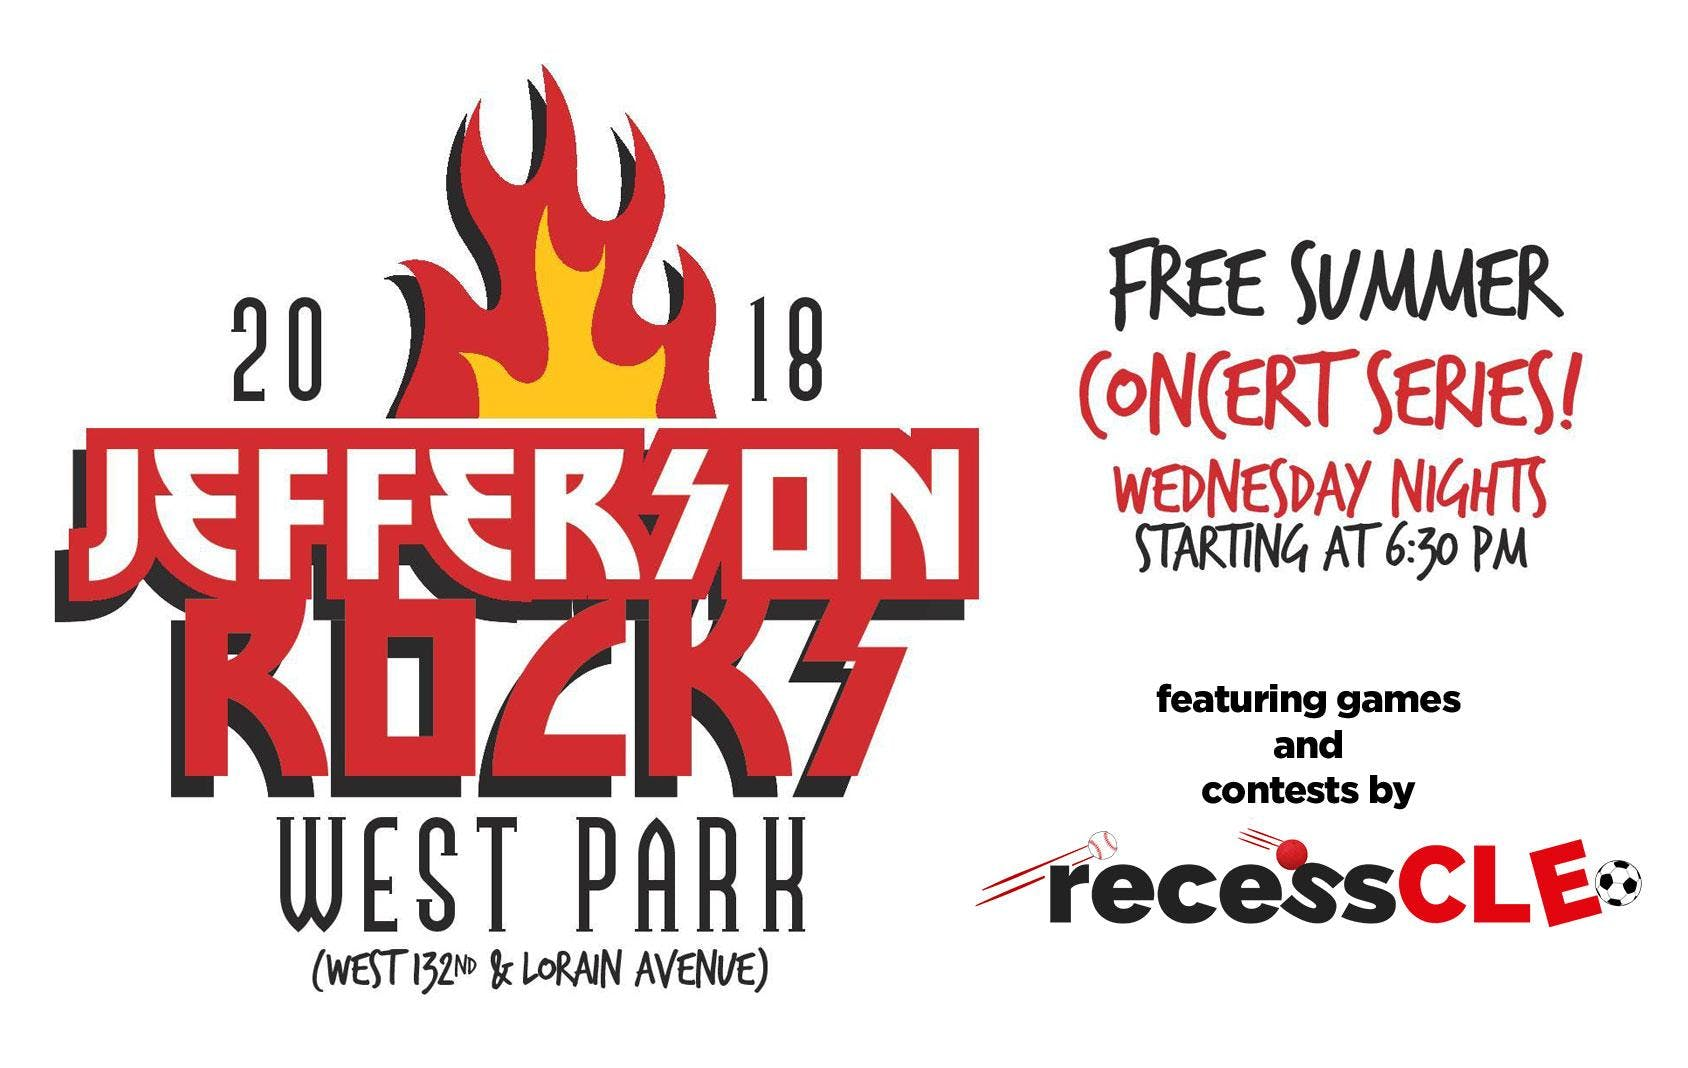 Jefferson Rocks - Free Summer Concert Series in West Park fRecess Cleveland